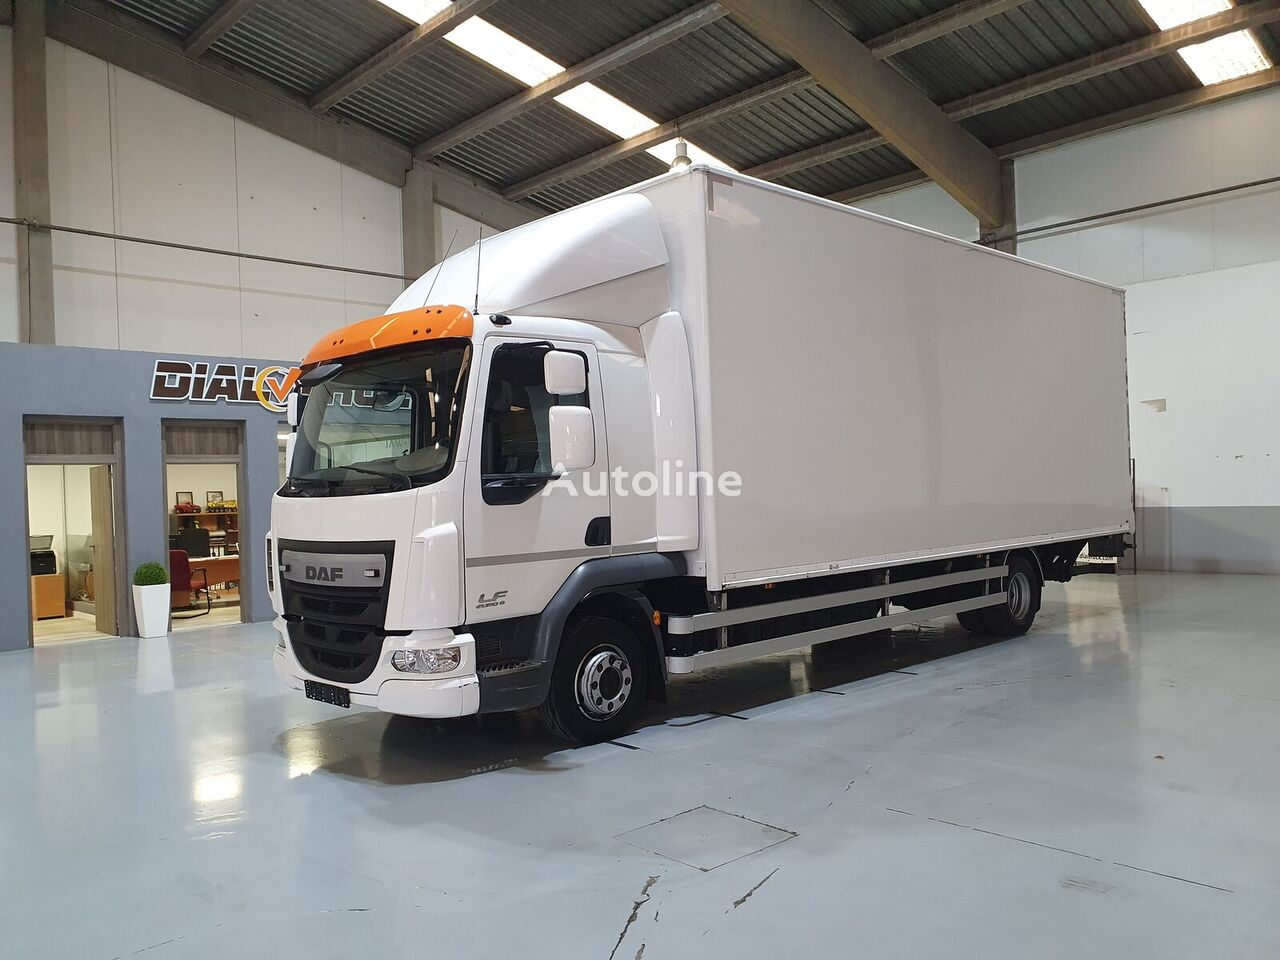 DAF LF 45 210 box truck